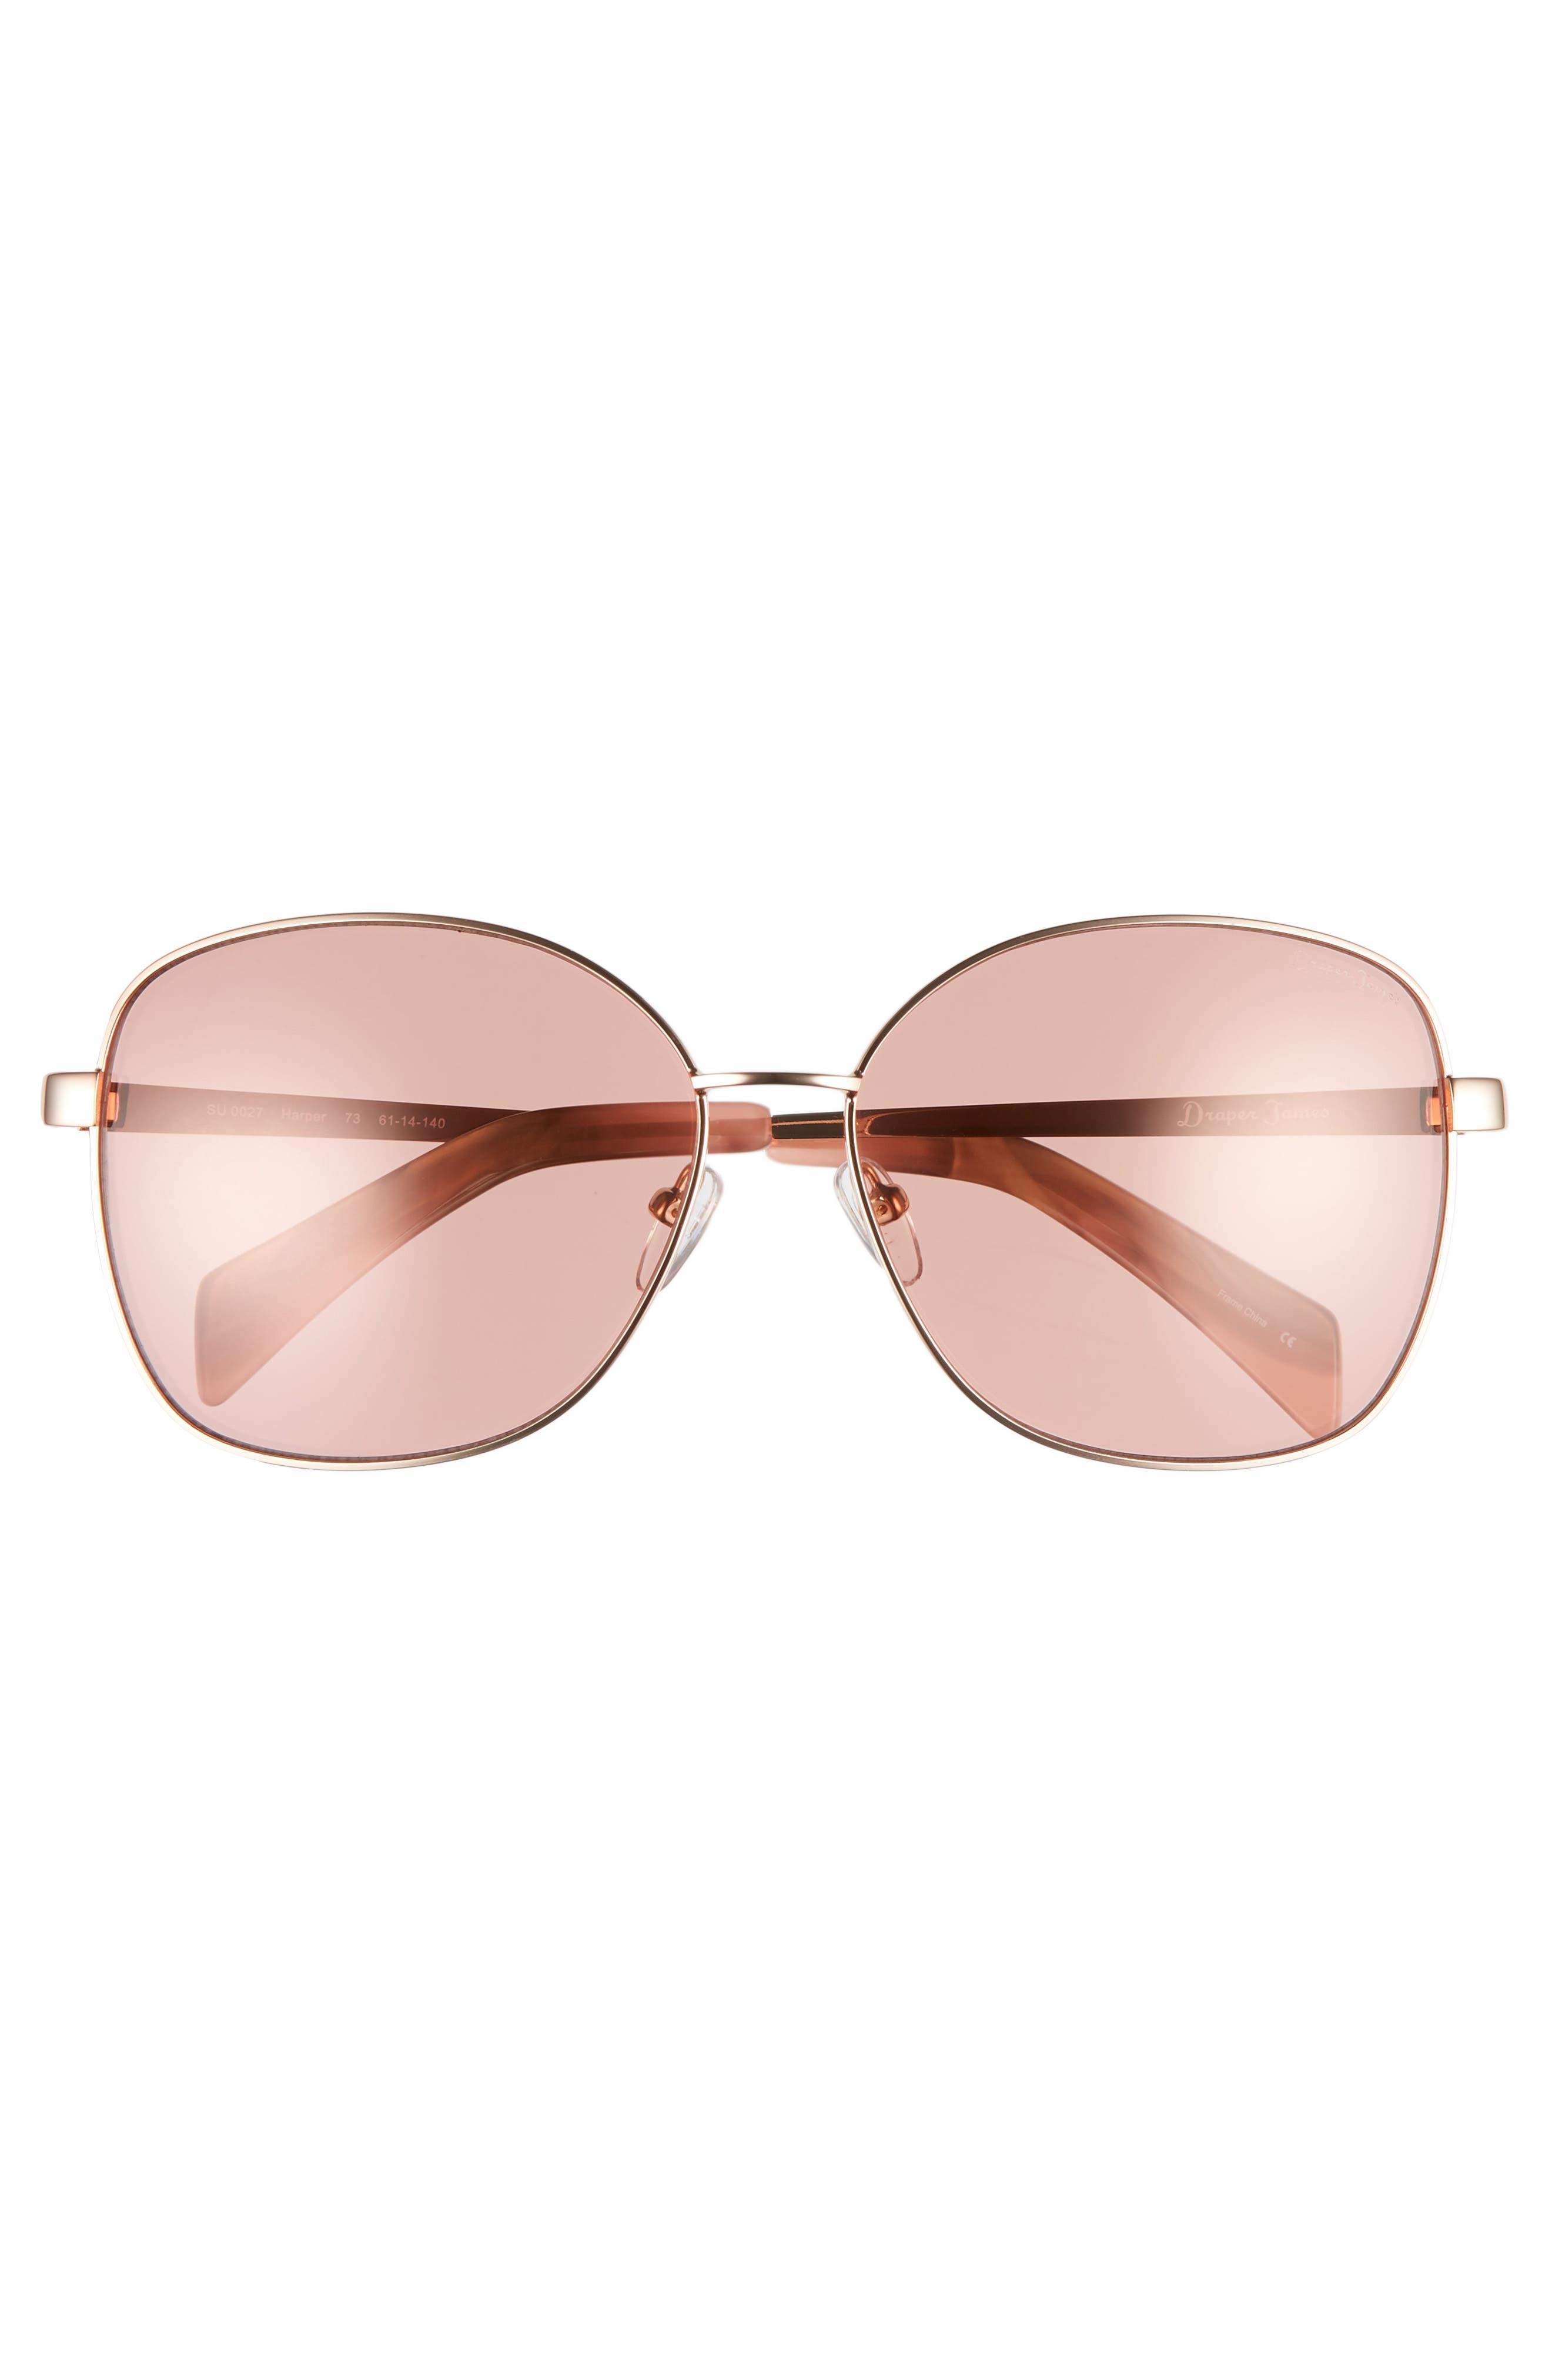 61mm Square Sunglasses,                             Alternate thumbnail 3, color,                             ROSE GOLD